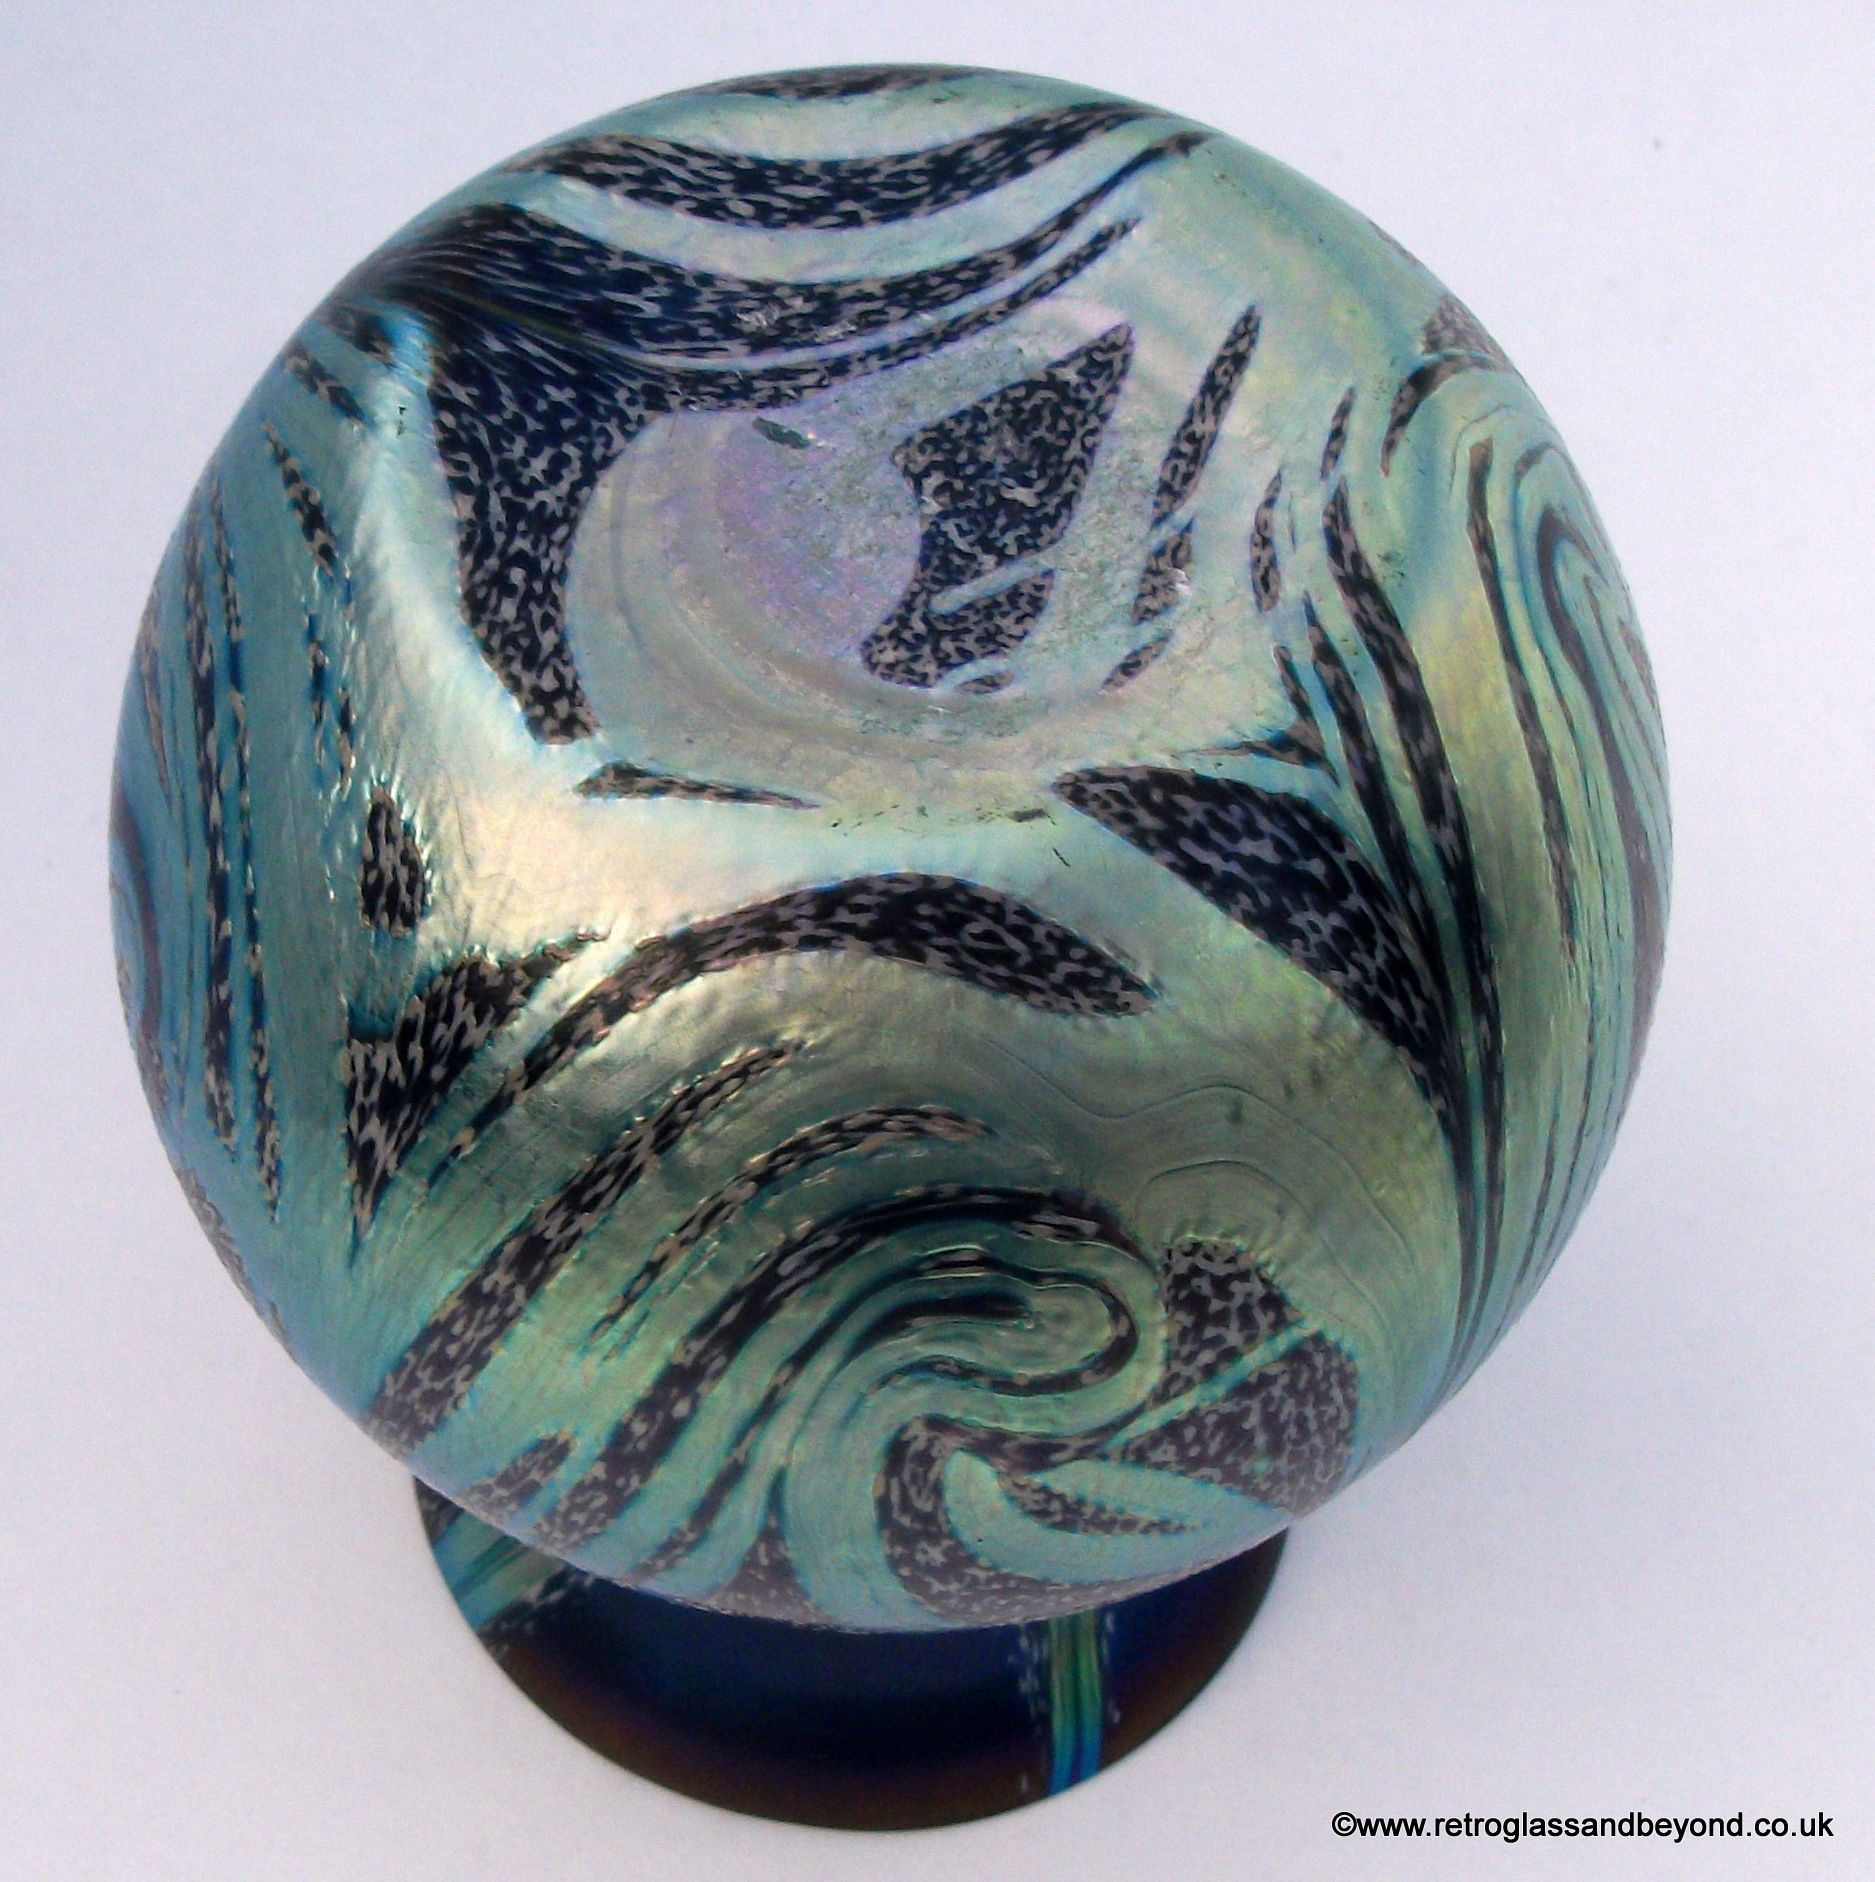 Emerald Art Glass okra studio range iridescent amethyst & emerald art glass vase